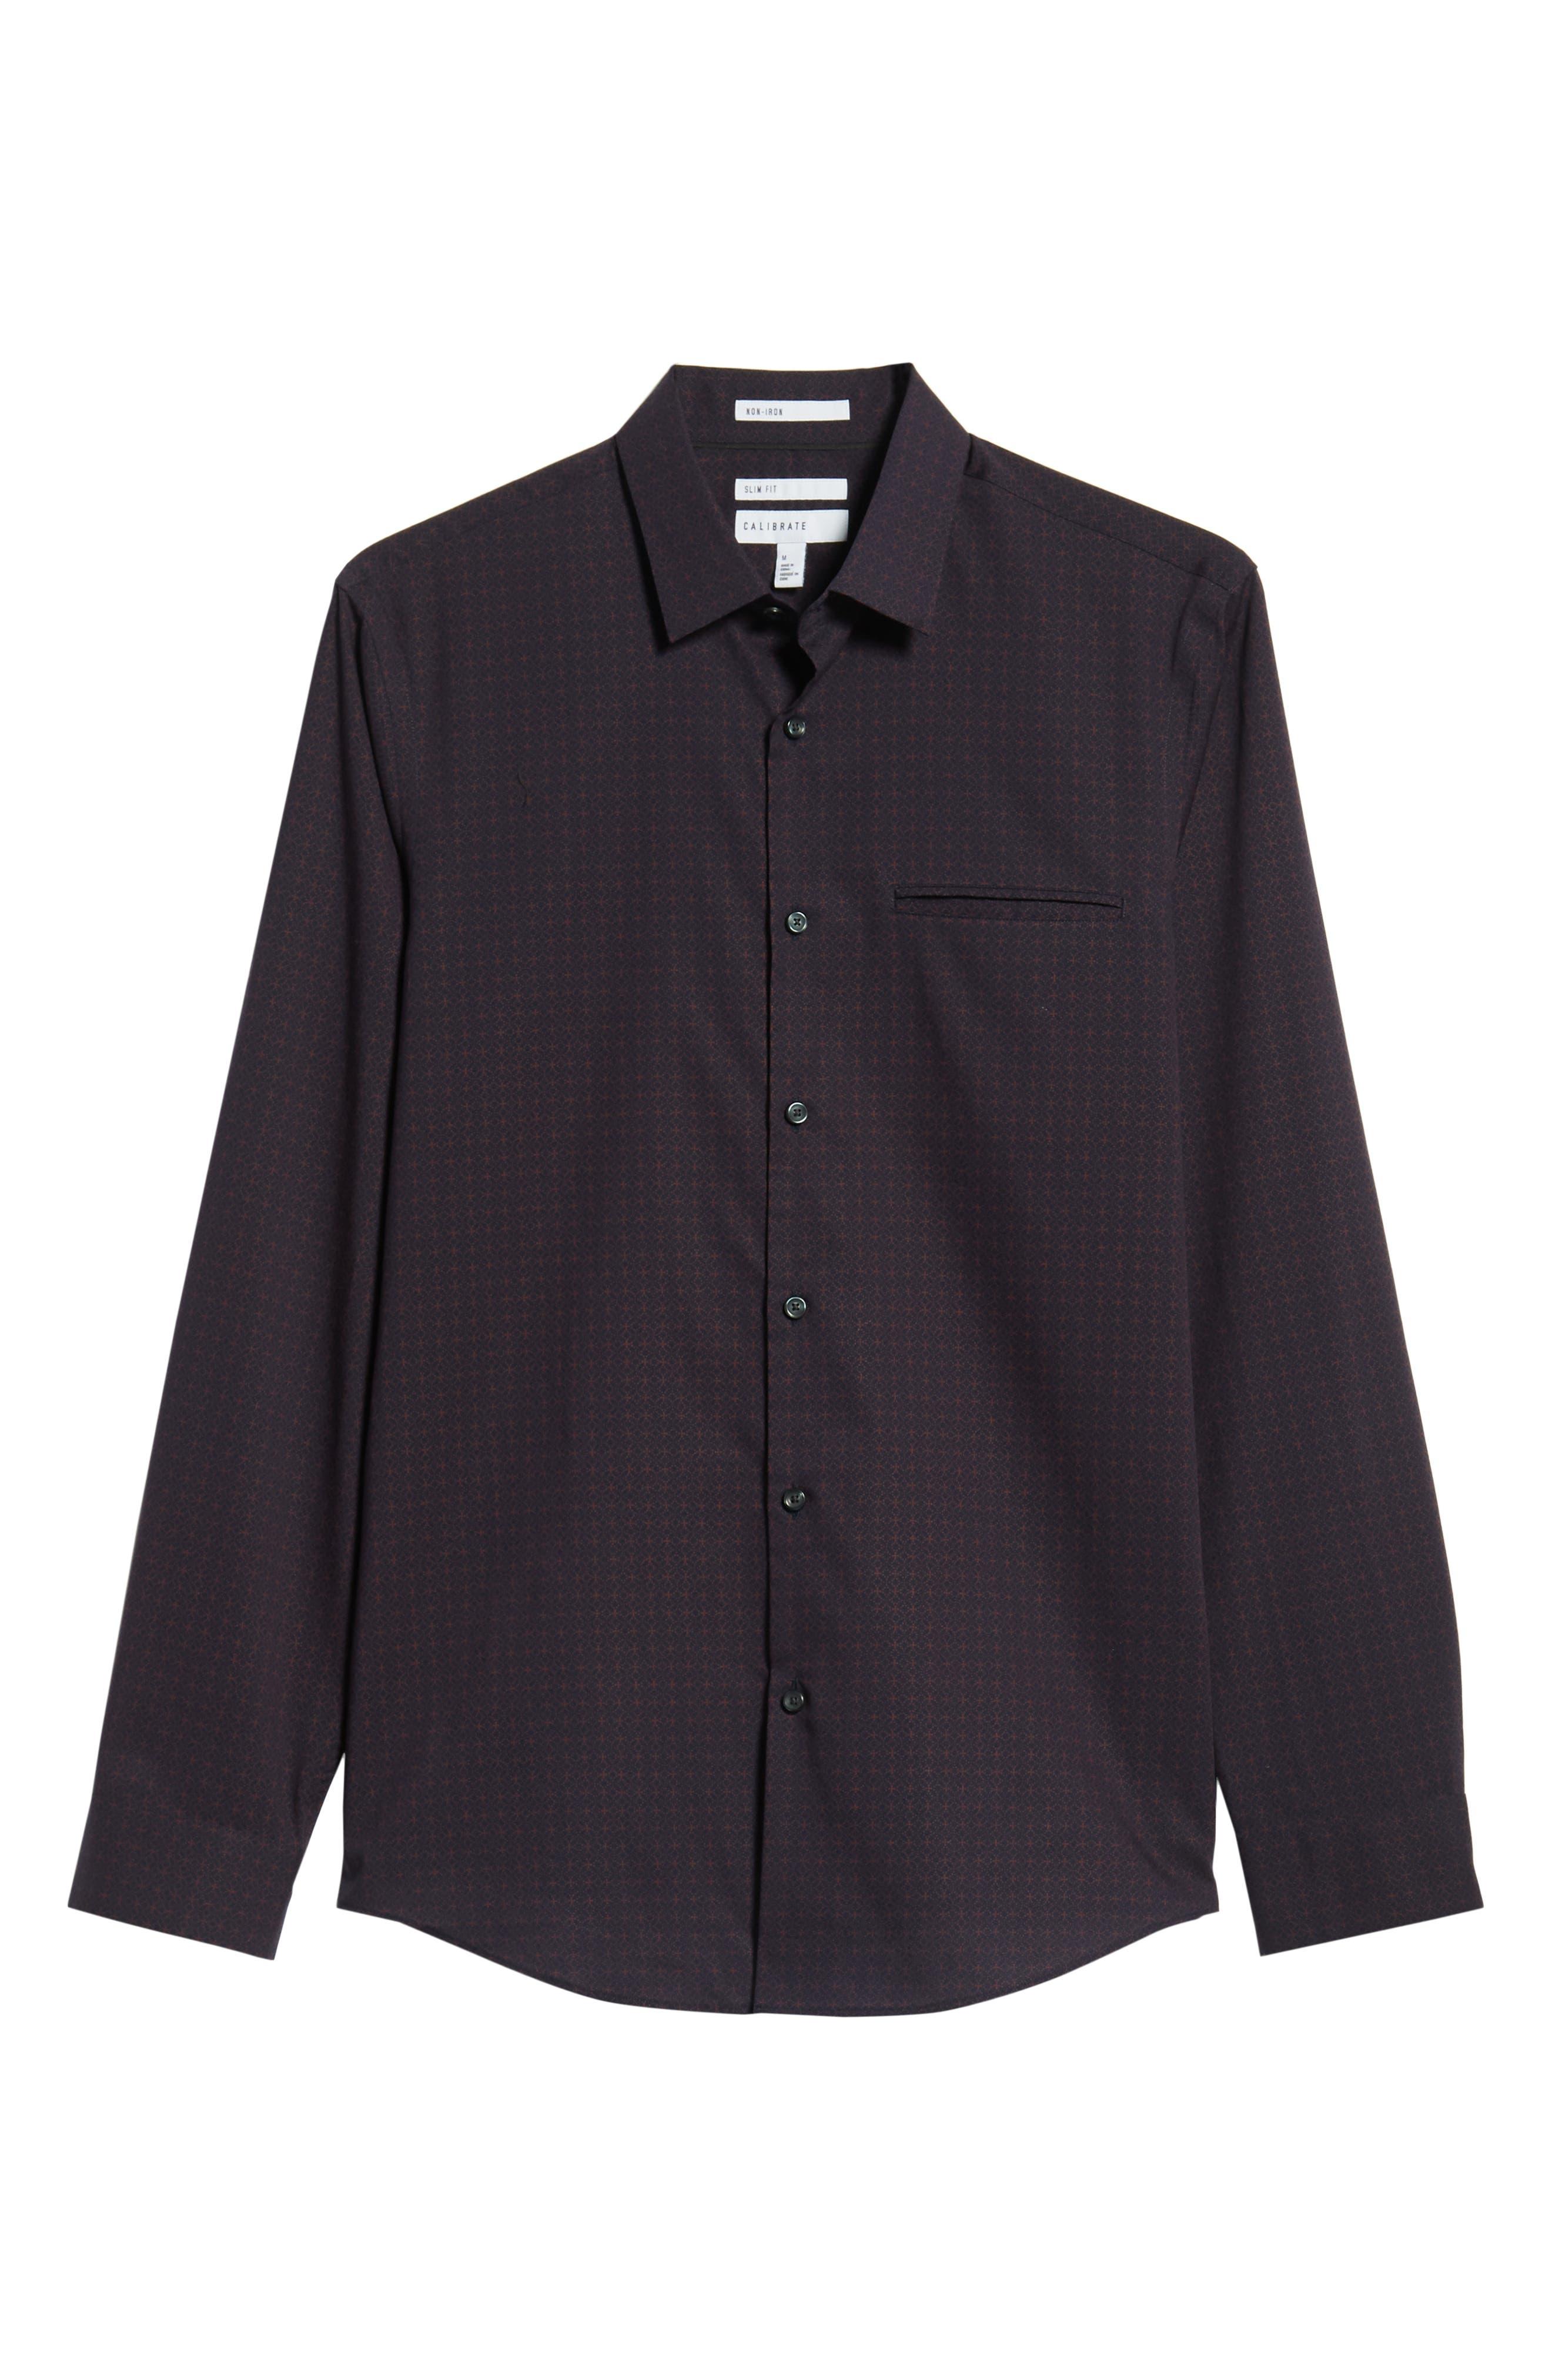 Slim Fit Print Non Iron Sport Shirt,                             Alternate thumbnail 6, color,                             NAVY NIGHT BURGUNDY GEO